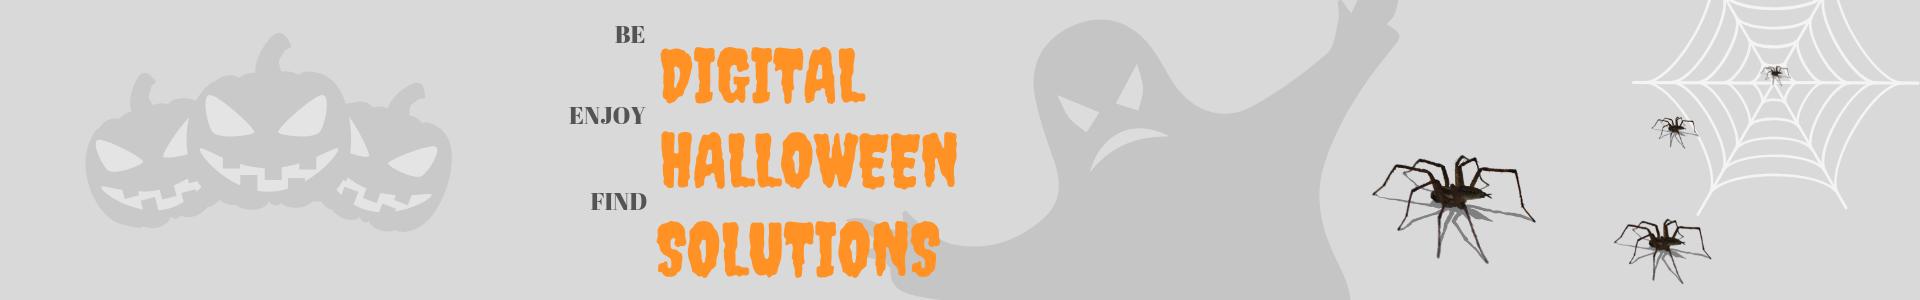 Digital Halloween Solutions